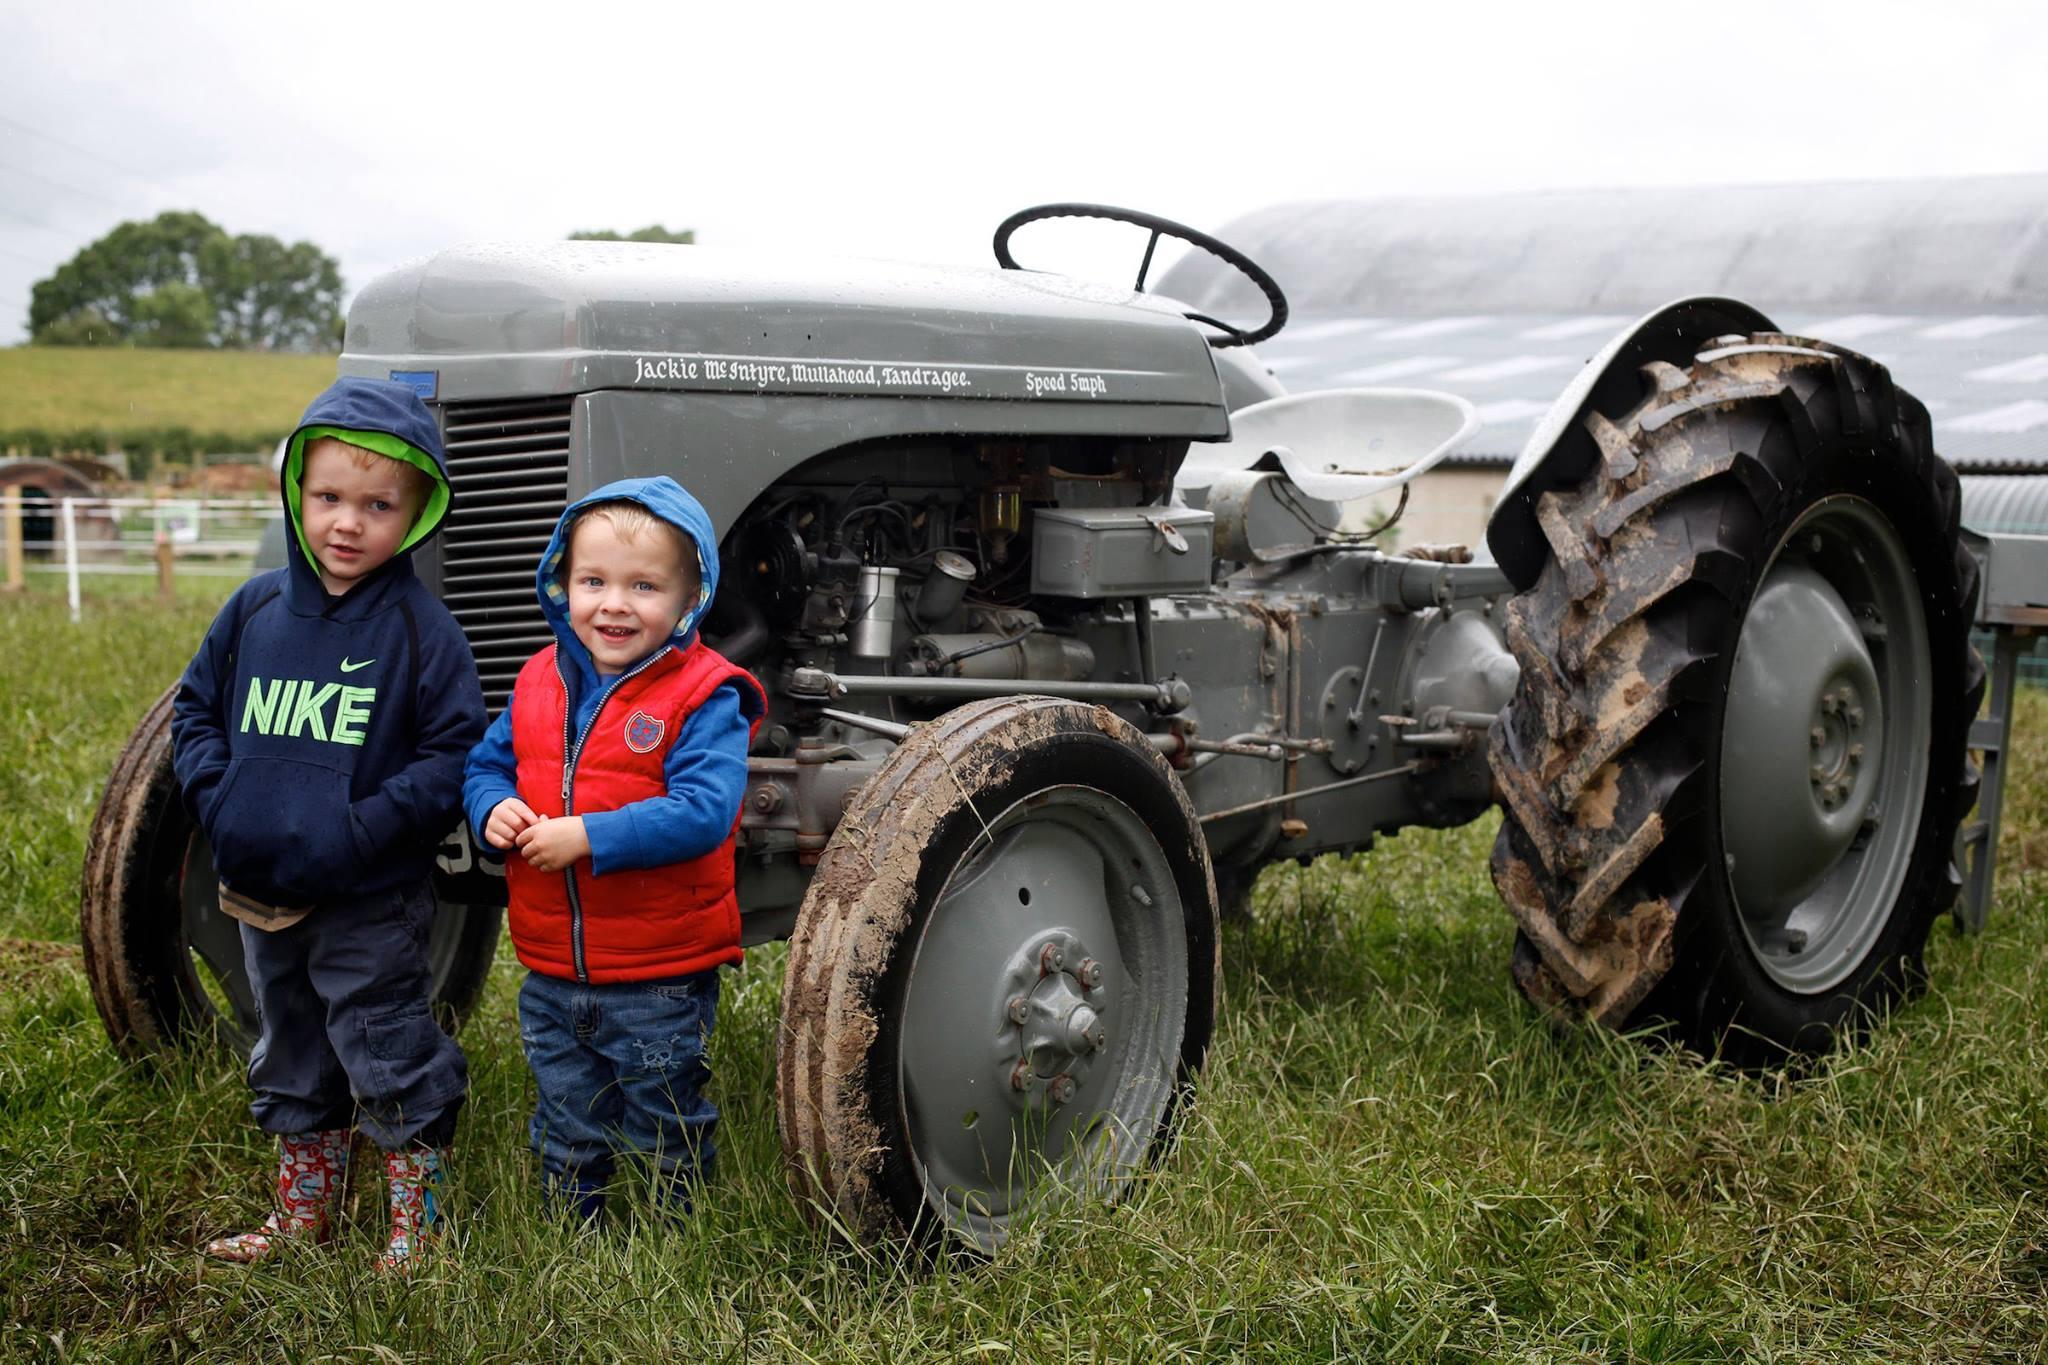 Bank of Ireland Open Farm Weekend 2016